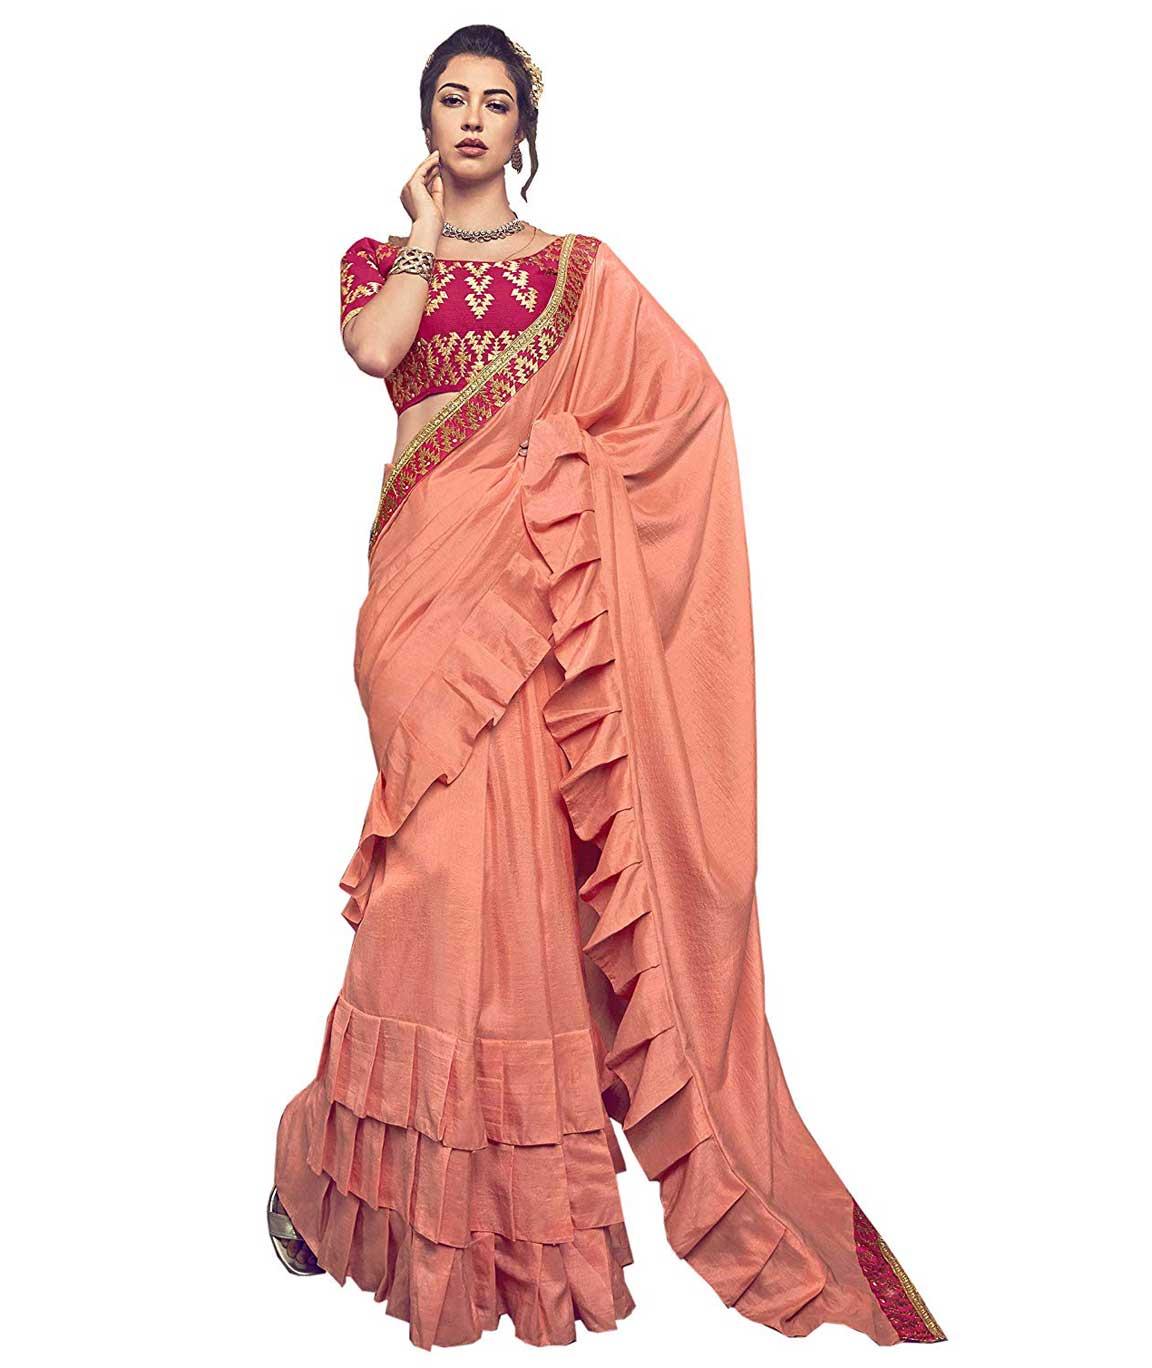 Shangrilla Designer Ruffled Pattern Border Chinon Silk Saree With Unstitched Blouse Piece (Orange)